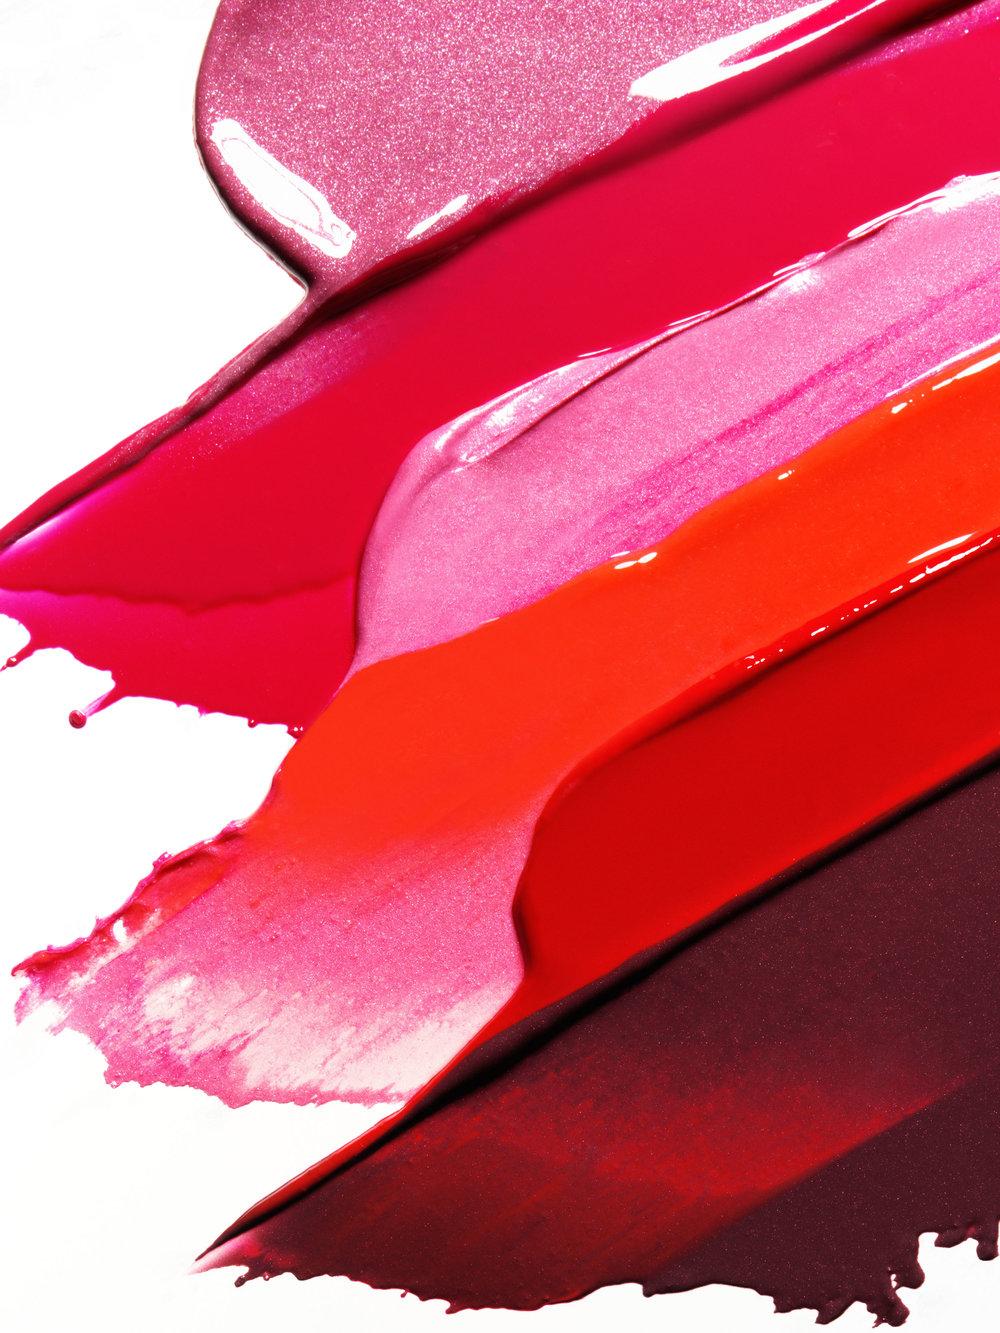 +lipstick_004_RS.jpg